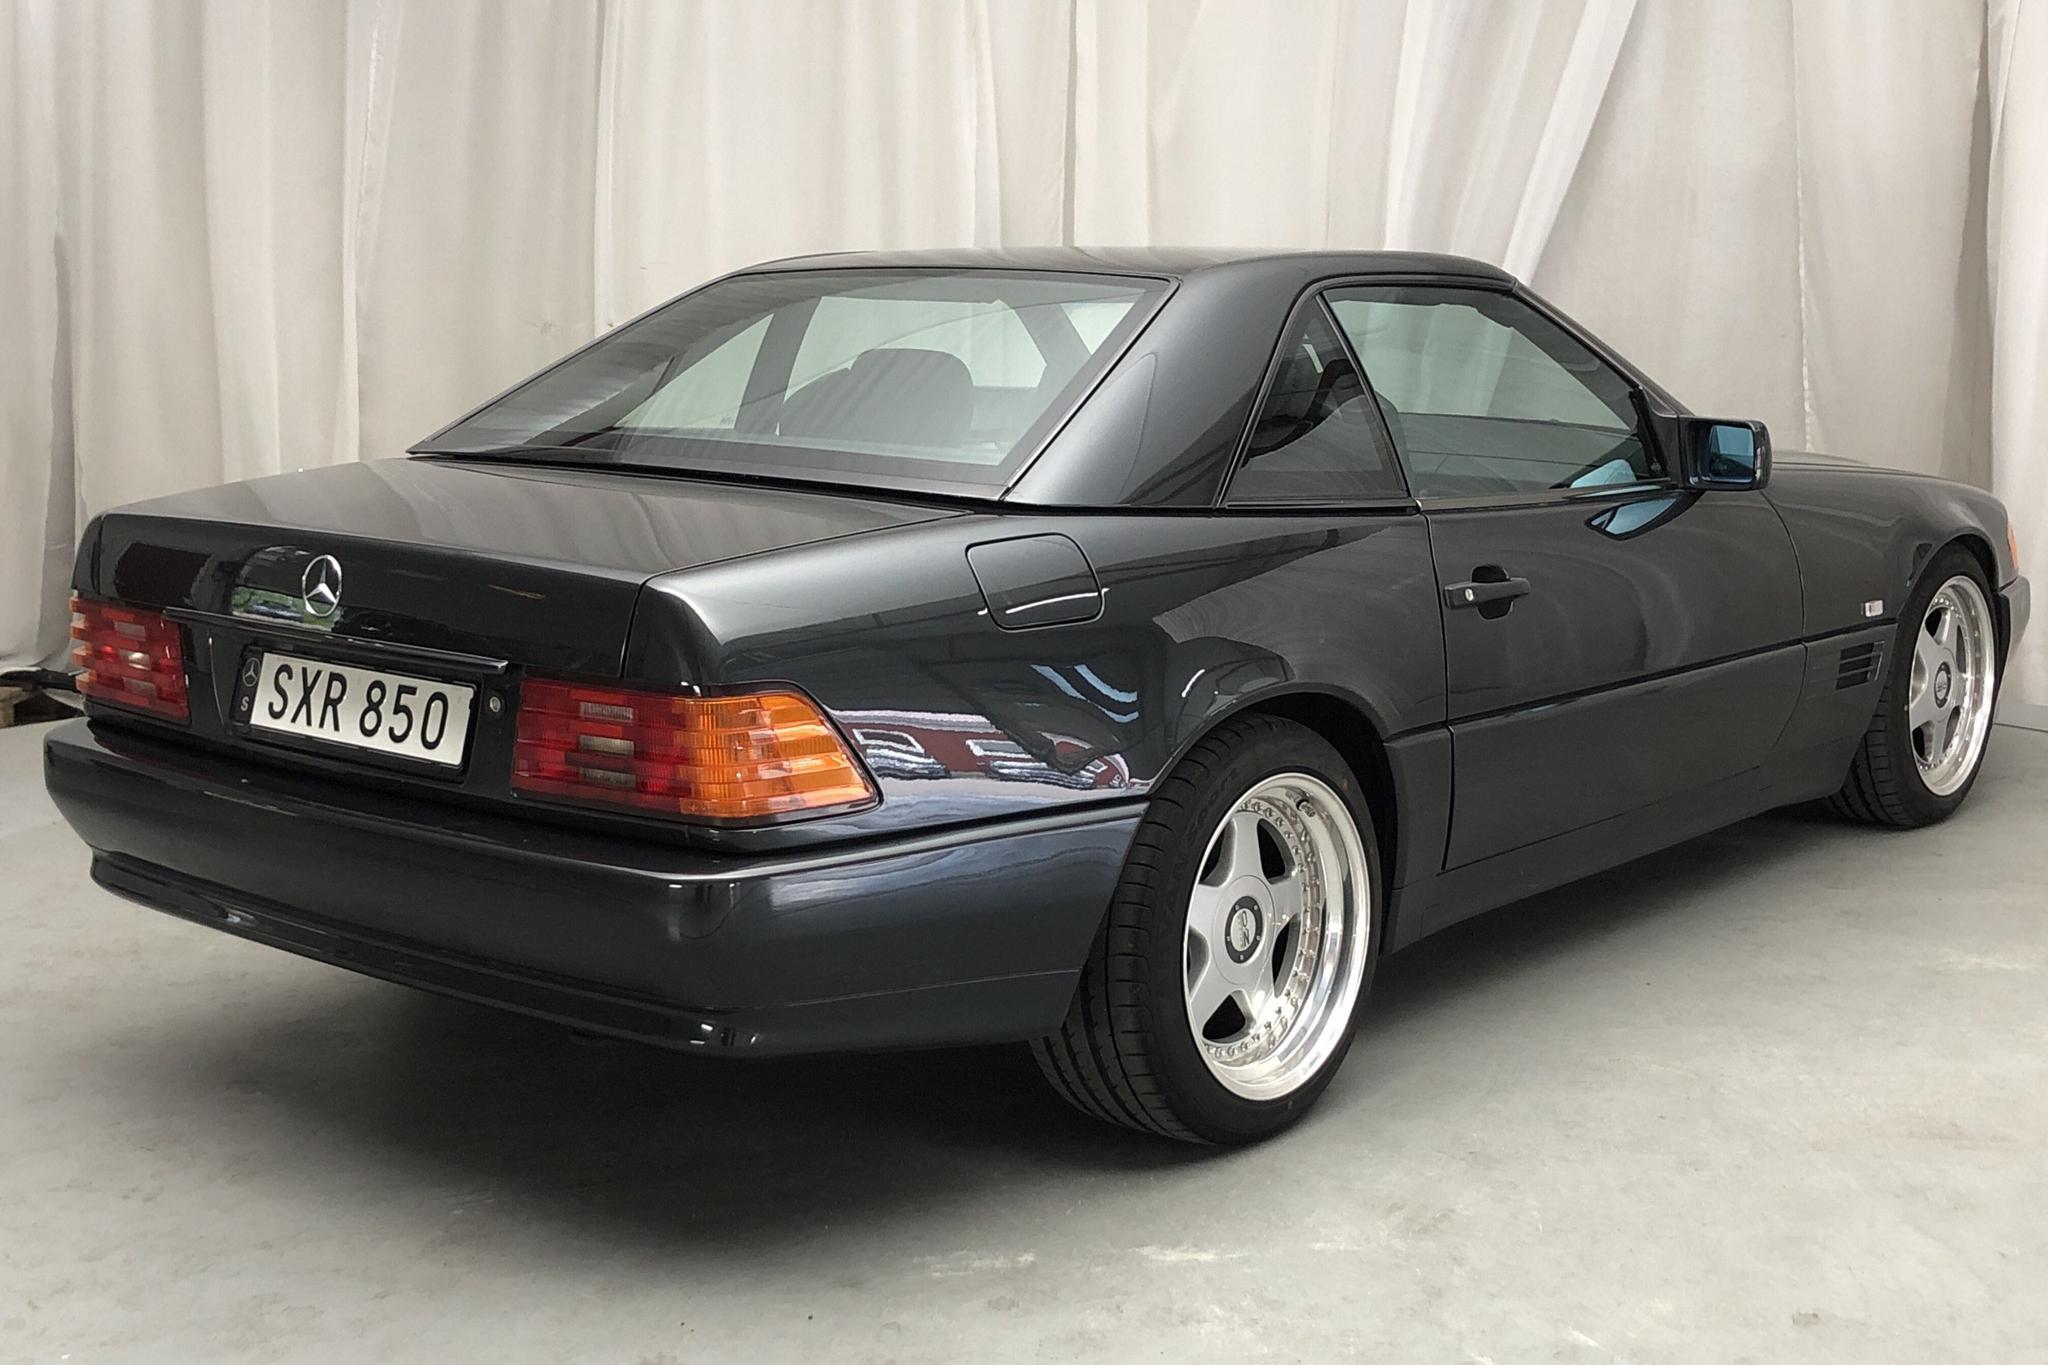 Mercedes SL 500 R129 (320hk) - 13 653 mil - Automat - svart - 1993